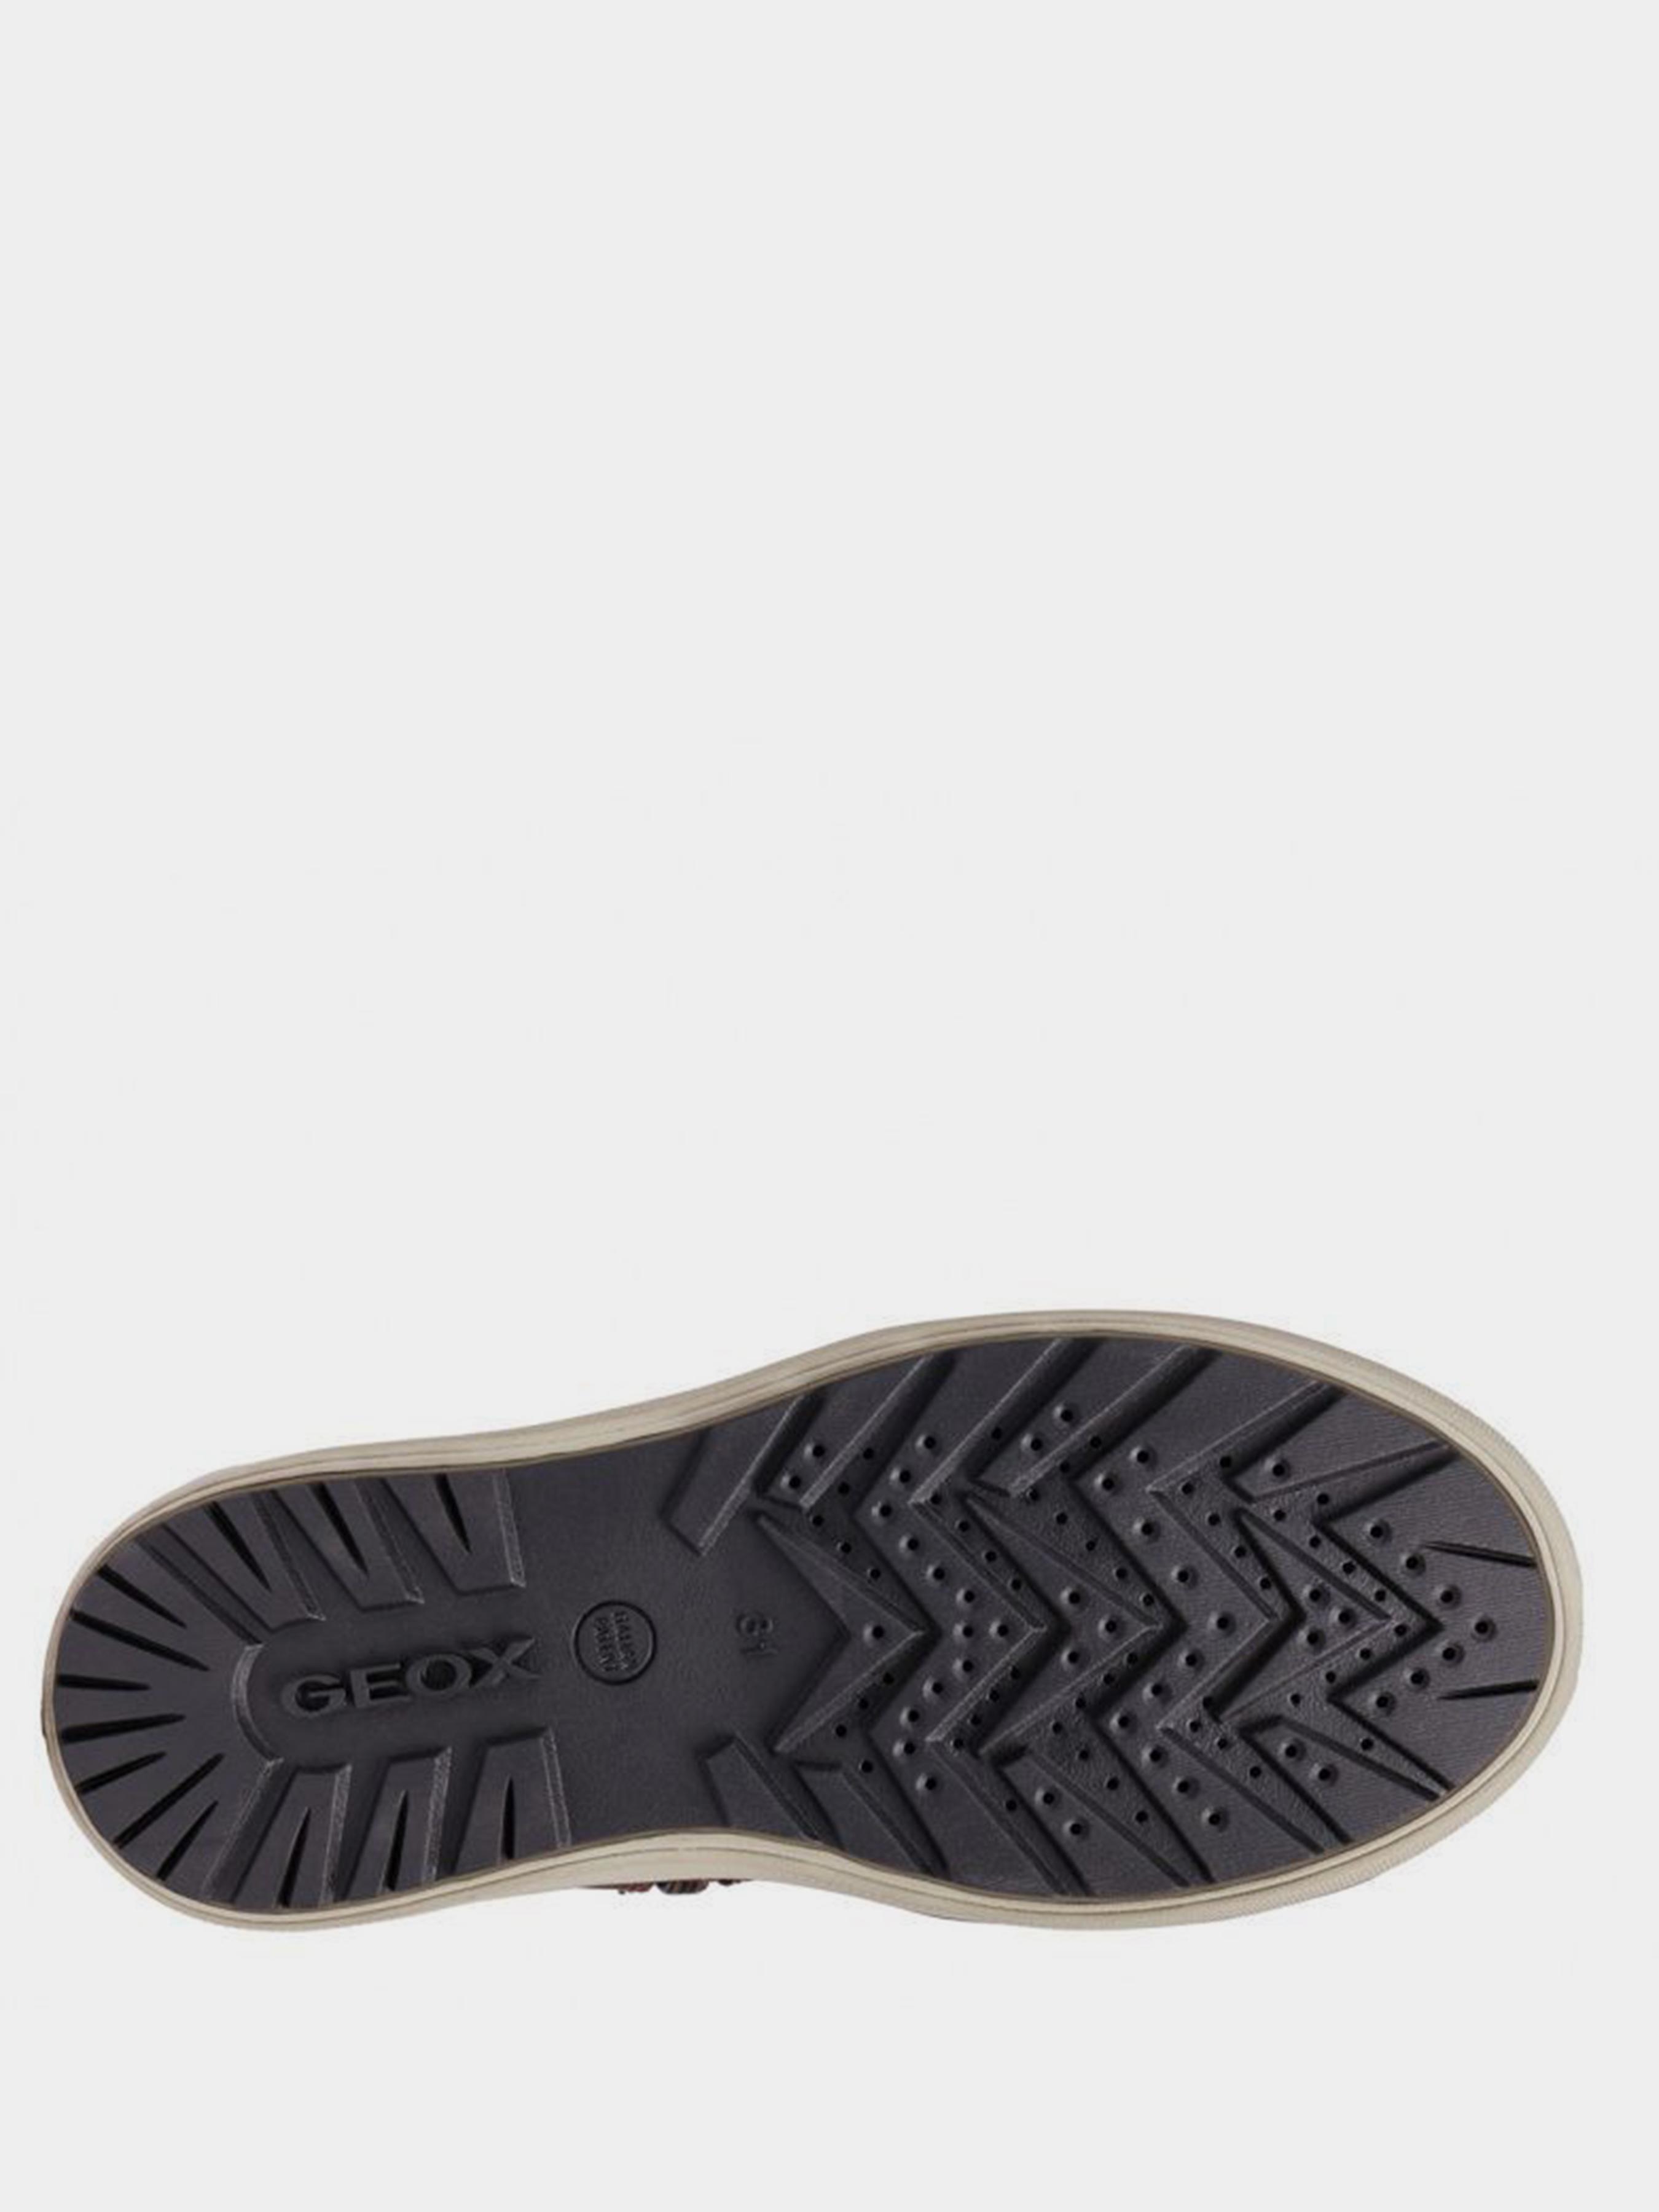 Ботинки детские Geox J MATTIAS B BOY ABX XK5893 продажа, 2017